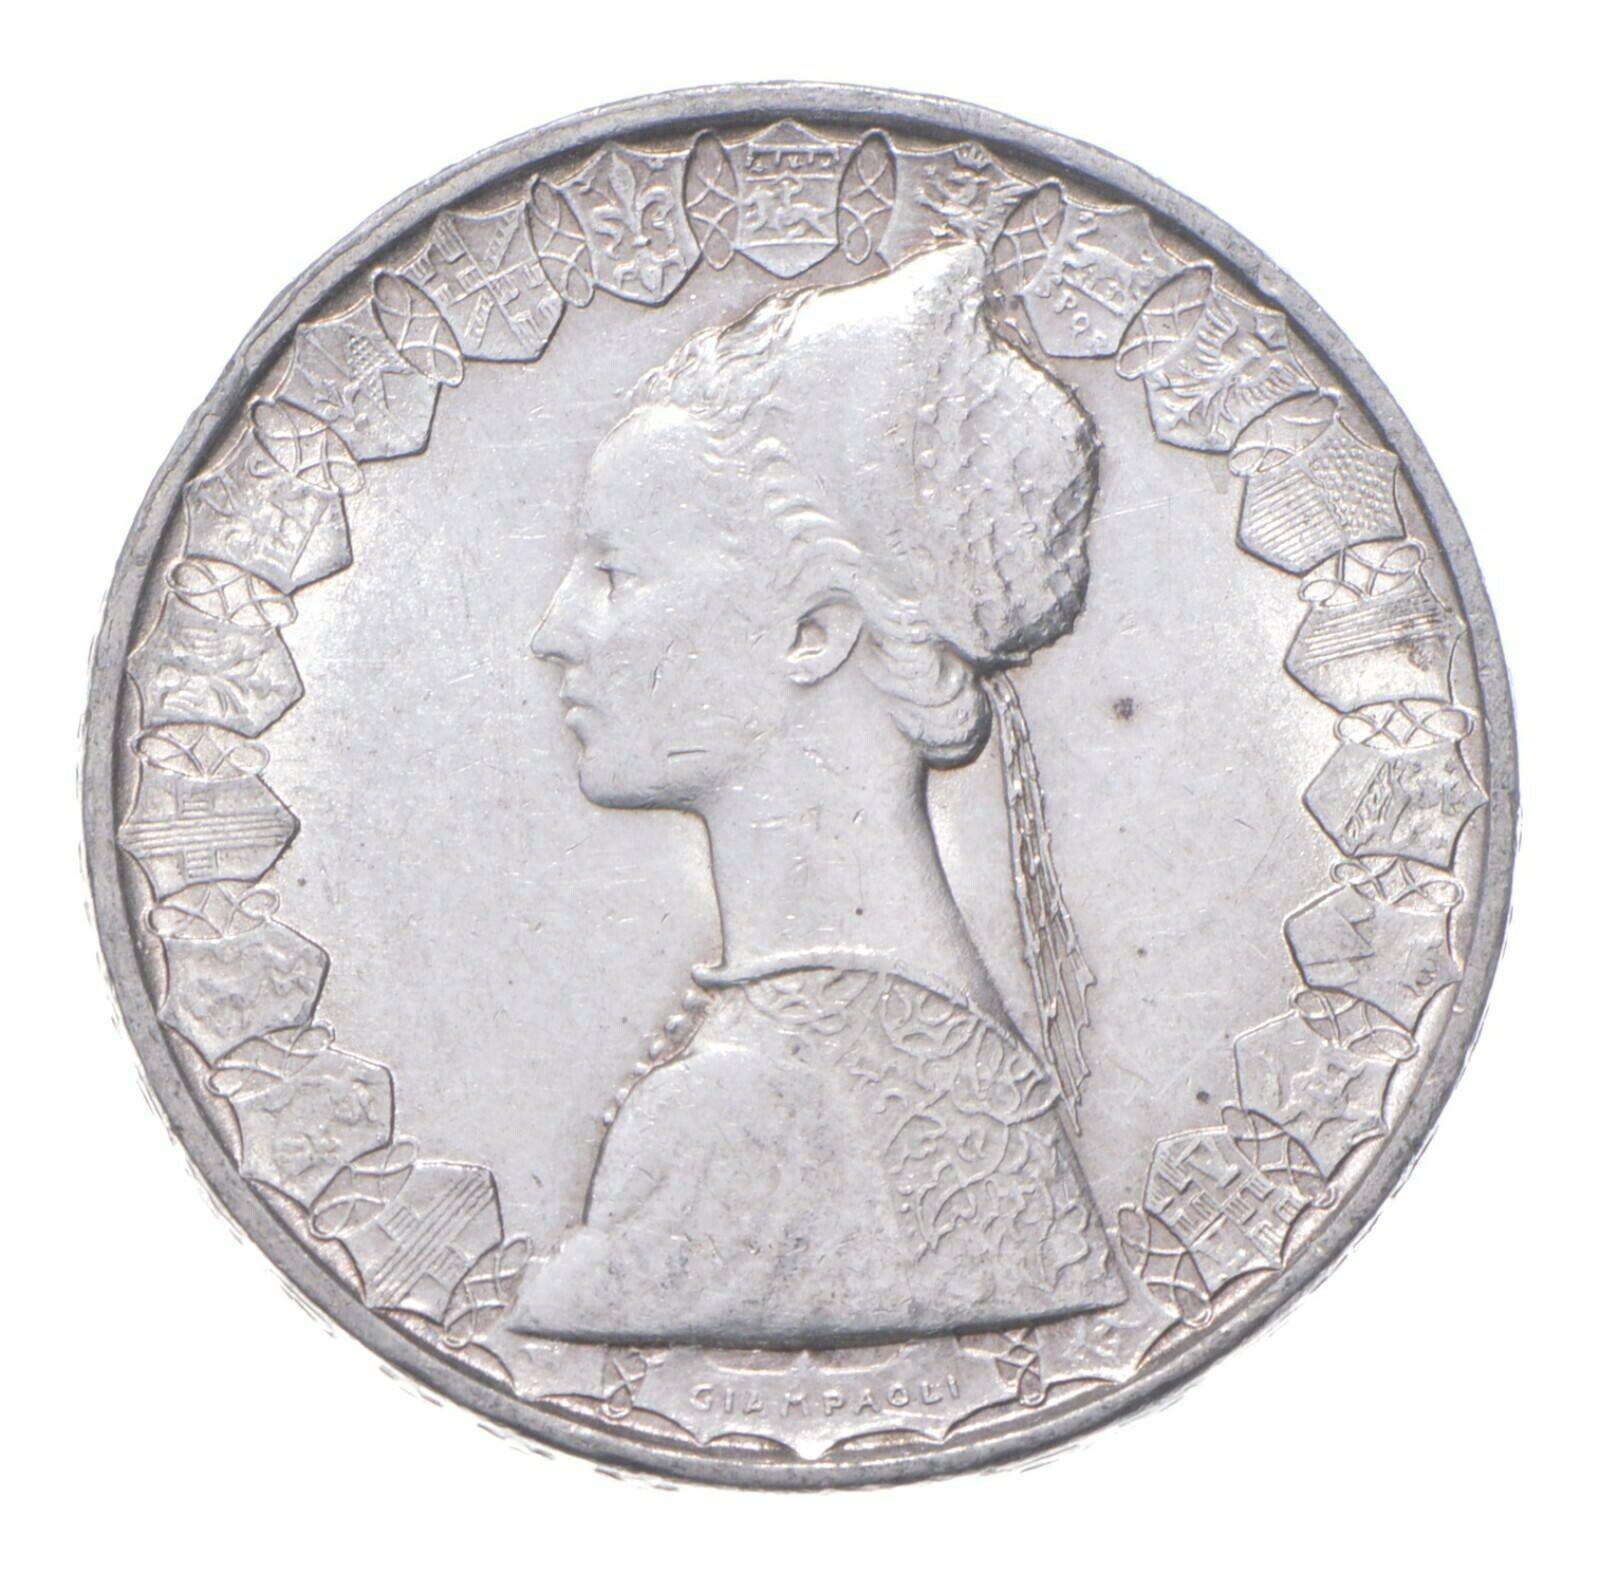 SILVER - WORLD Coin - 1960s Italy 500 Lire - World Silver Coin 367 - $13.06